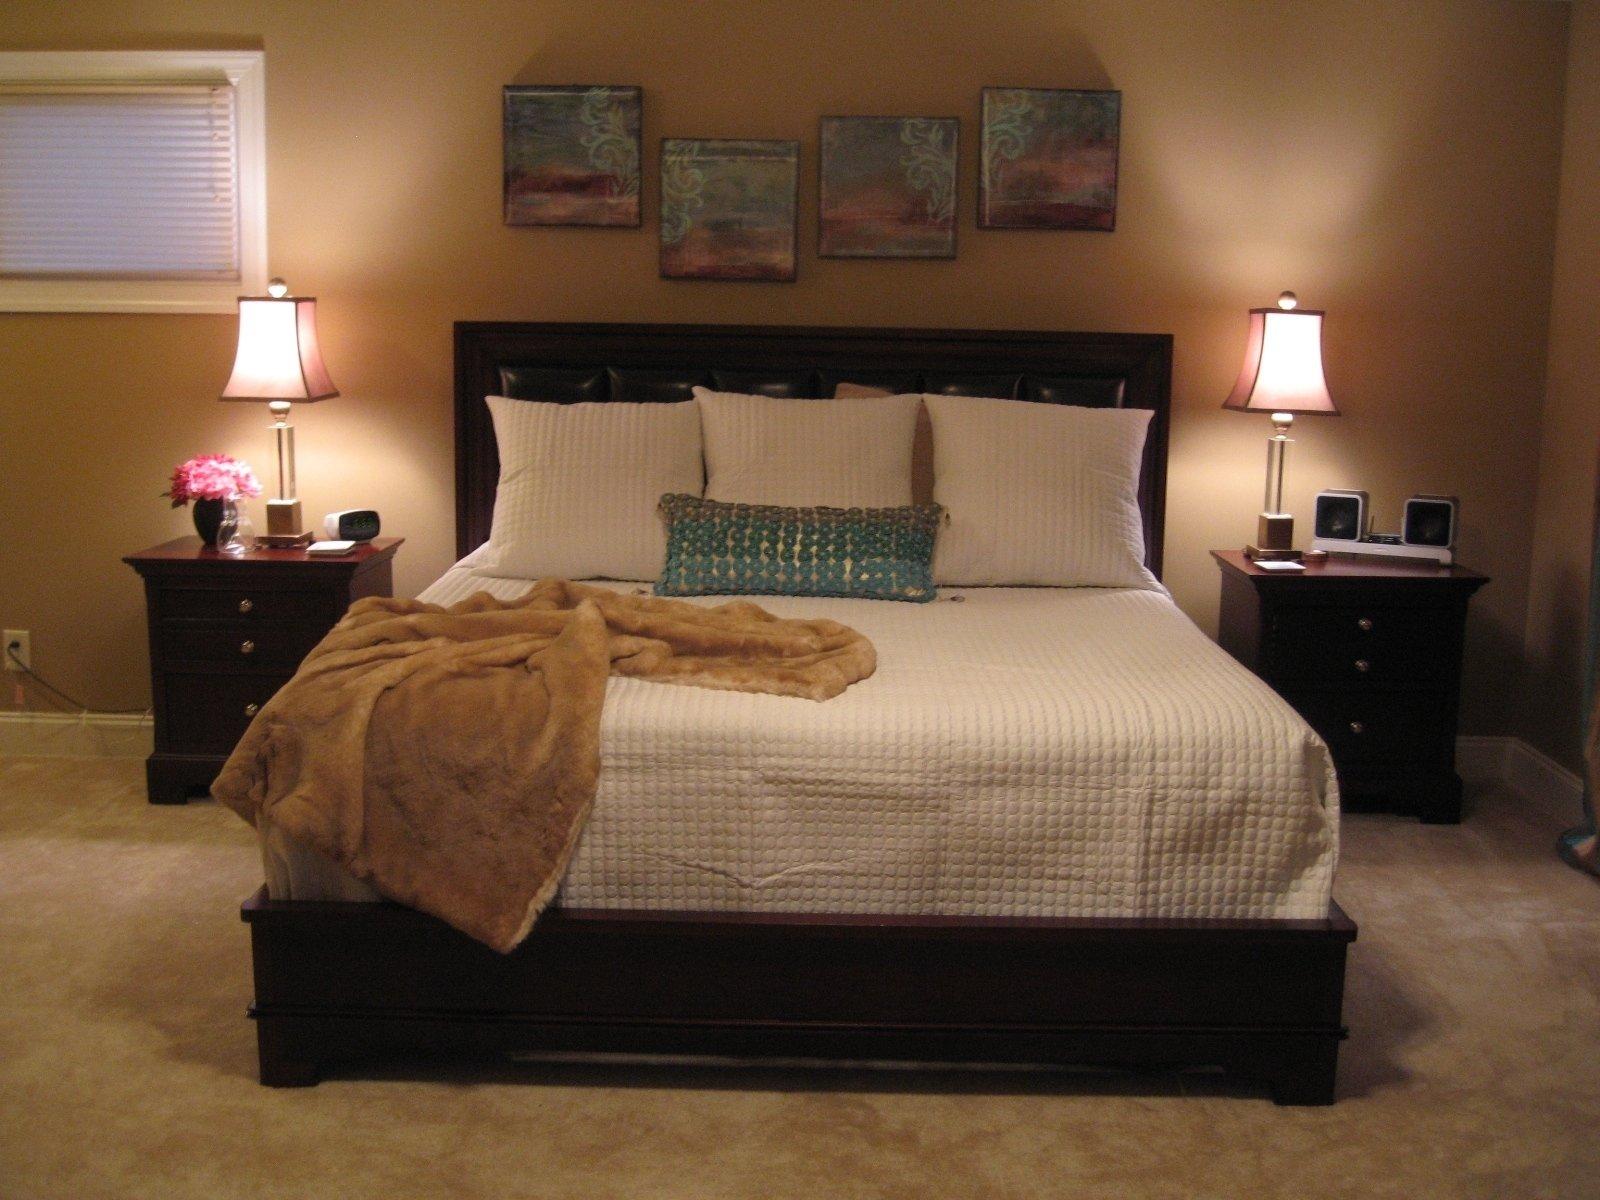 10 Beautiful Master Bedroom Ideas On A Budget wonderful master bedroom design ideas on a budget about interior 1 2020